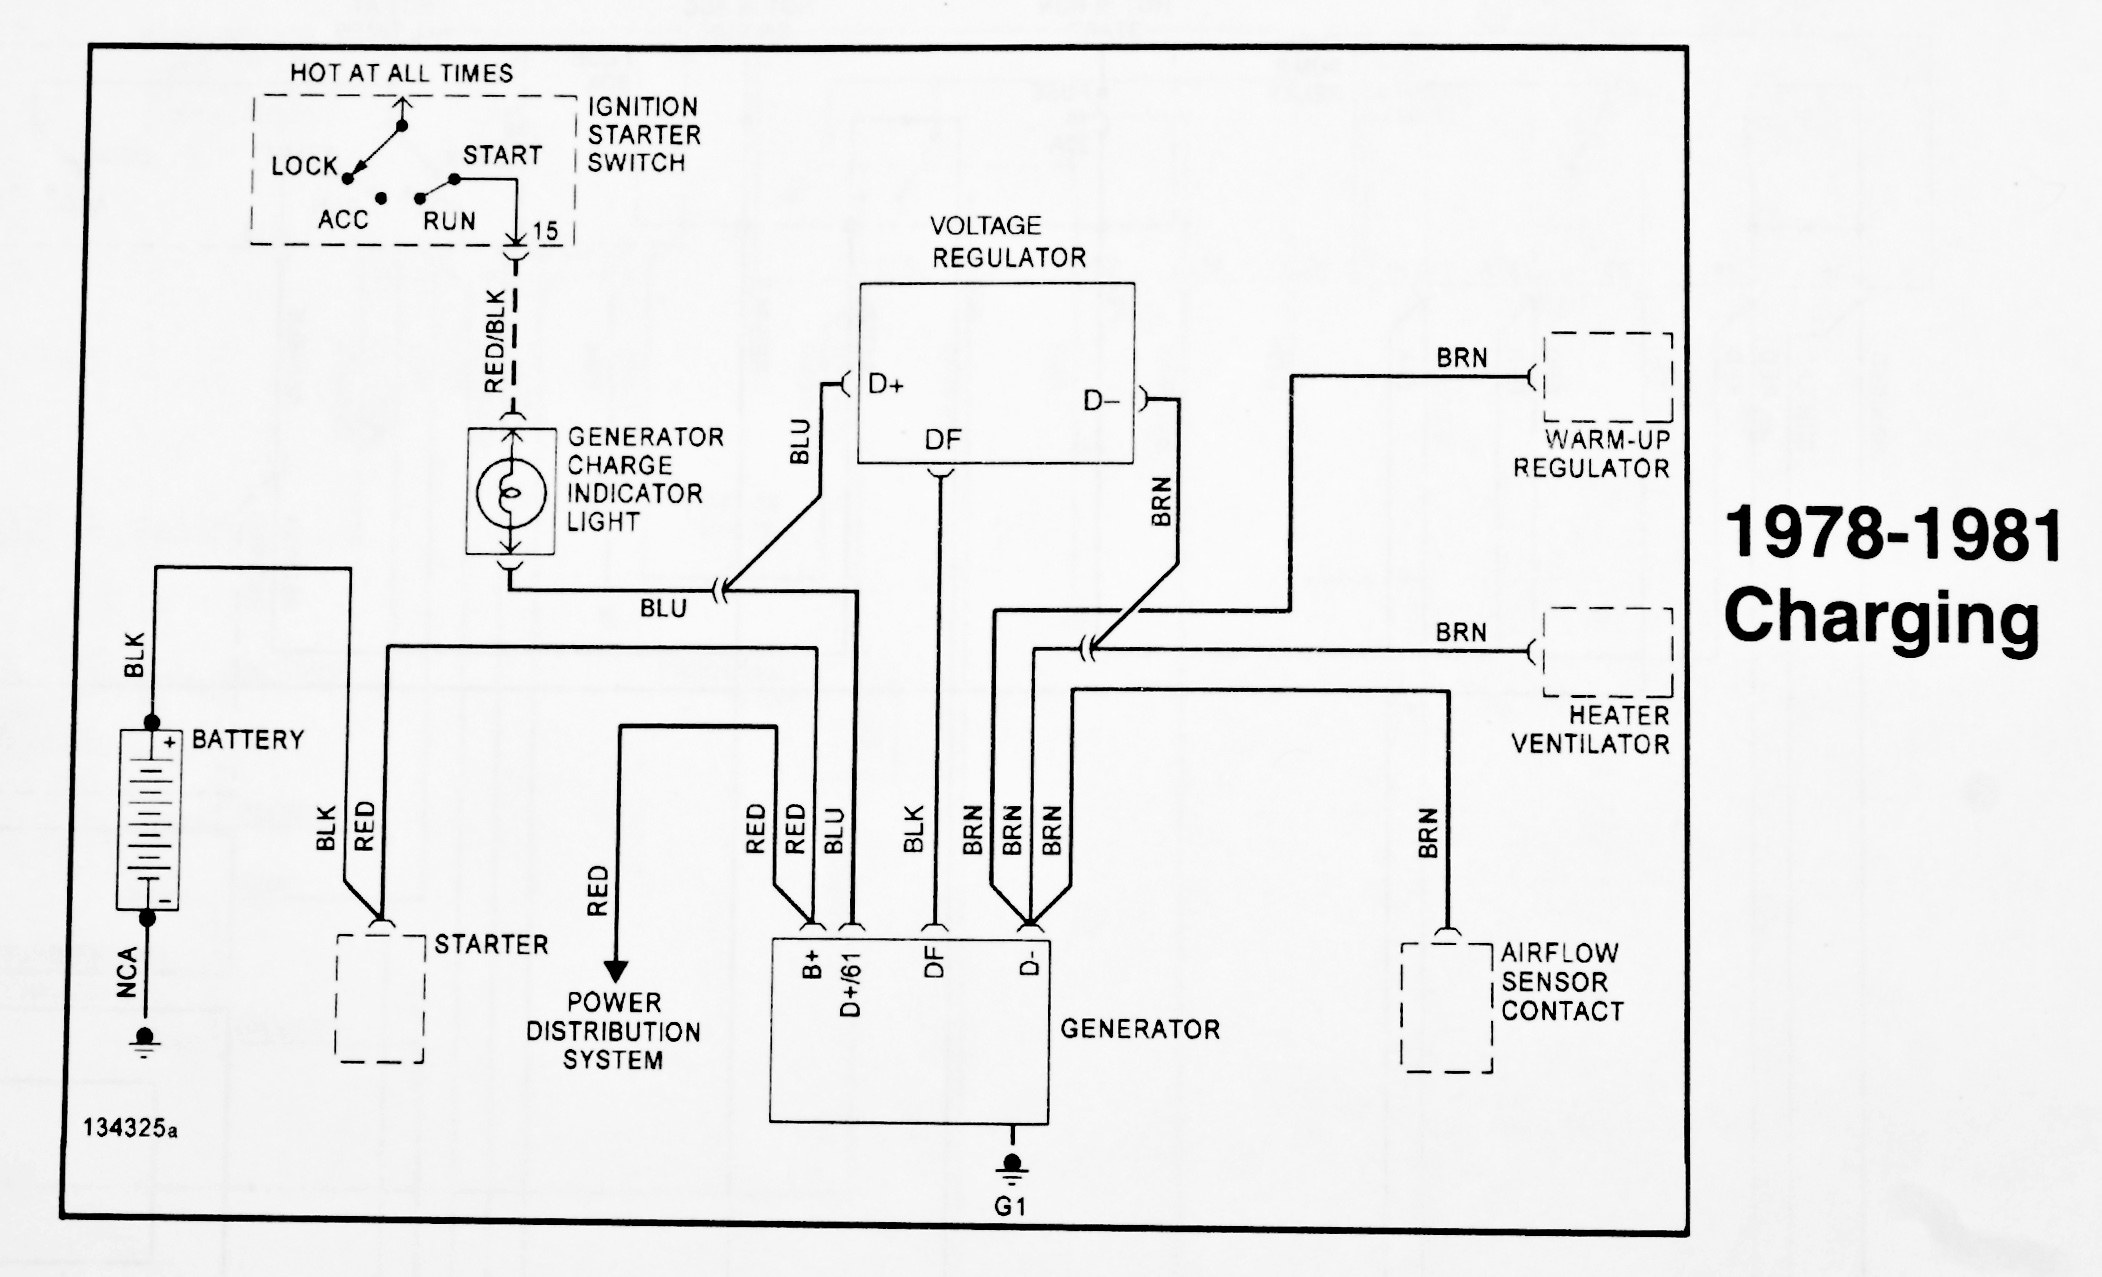 small resolution of 1981 porsche 911 wiring diagram electrical schematic wiring diagram 1974 porsche wiring diagram